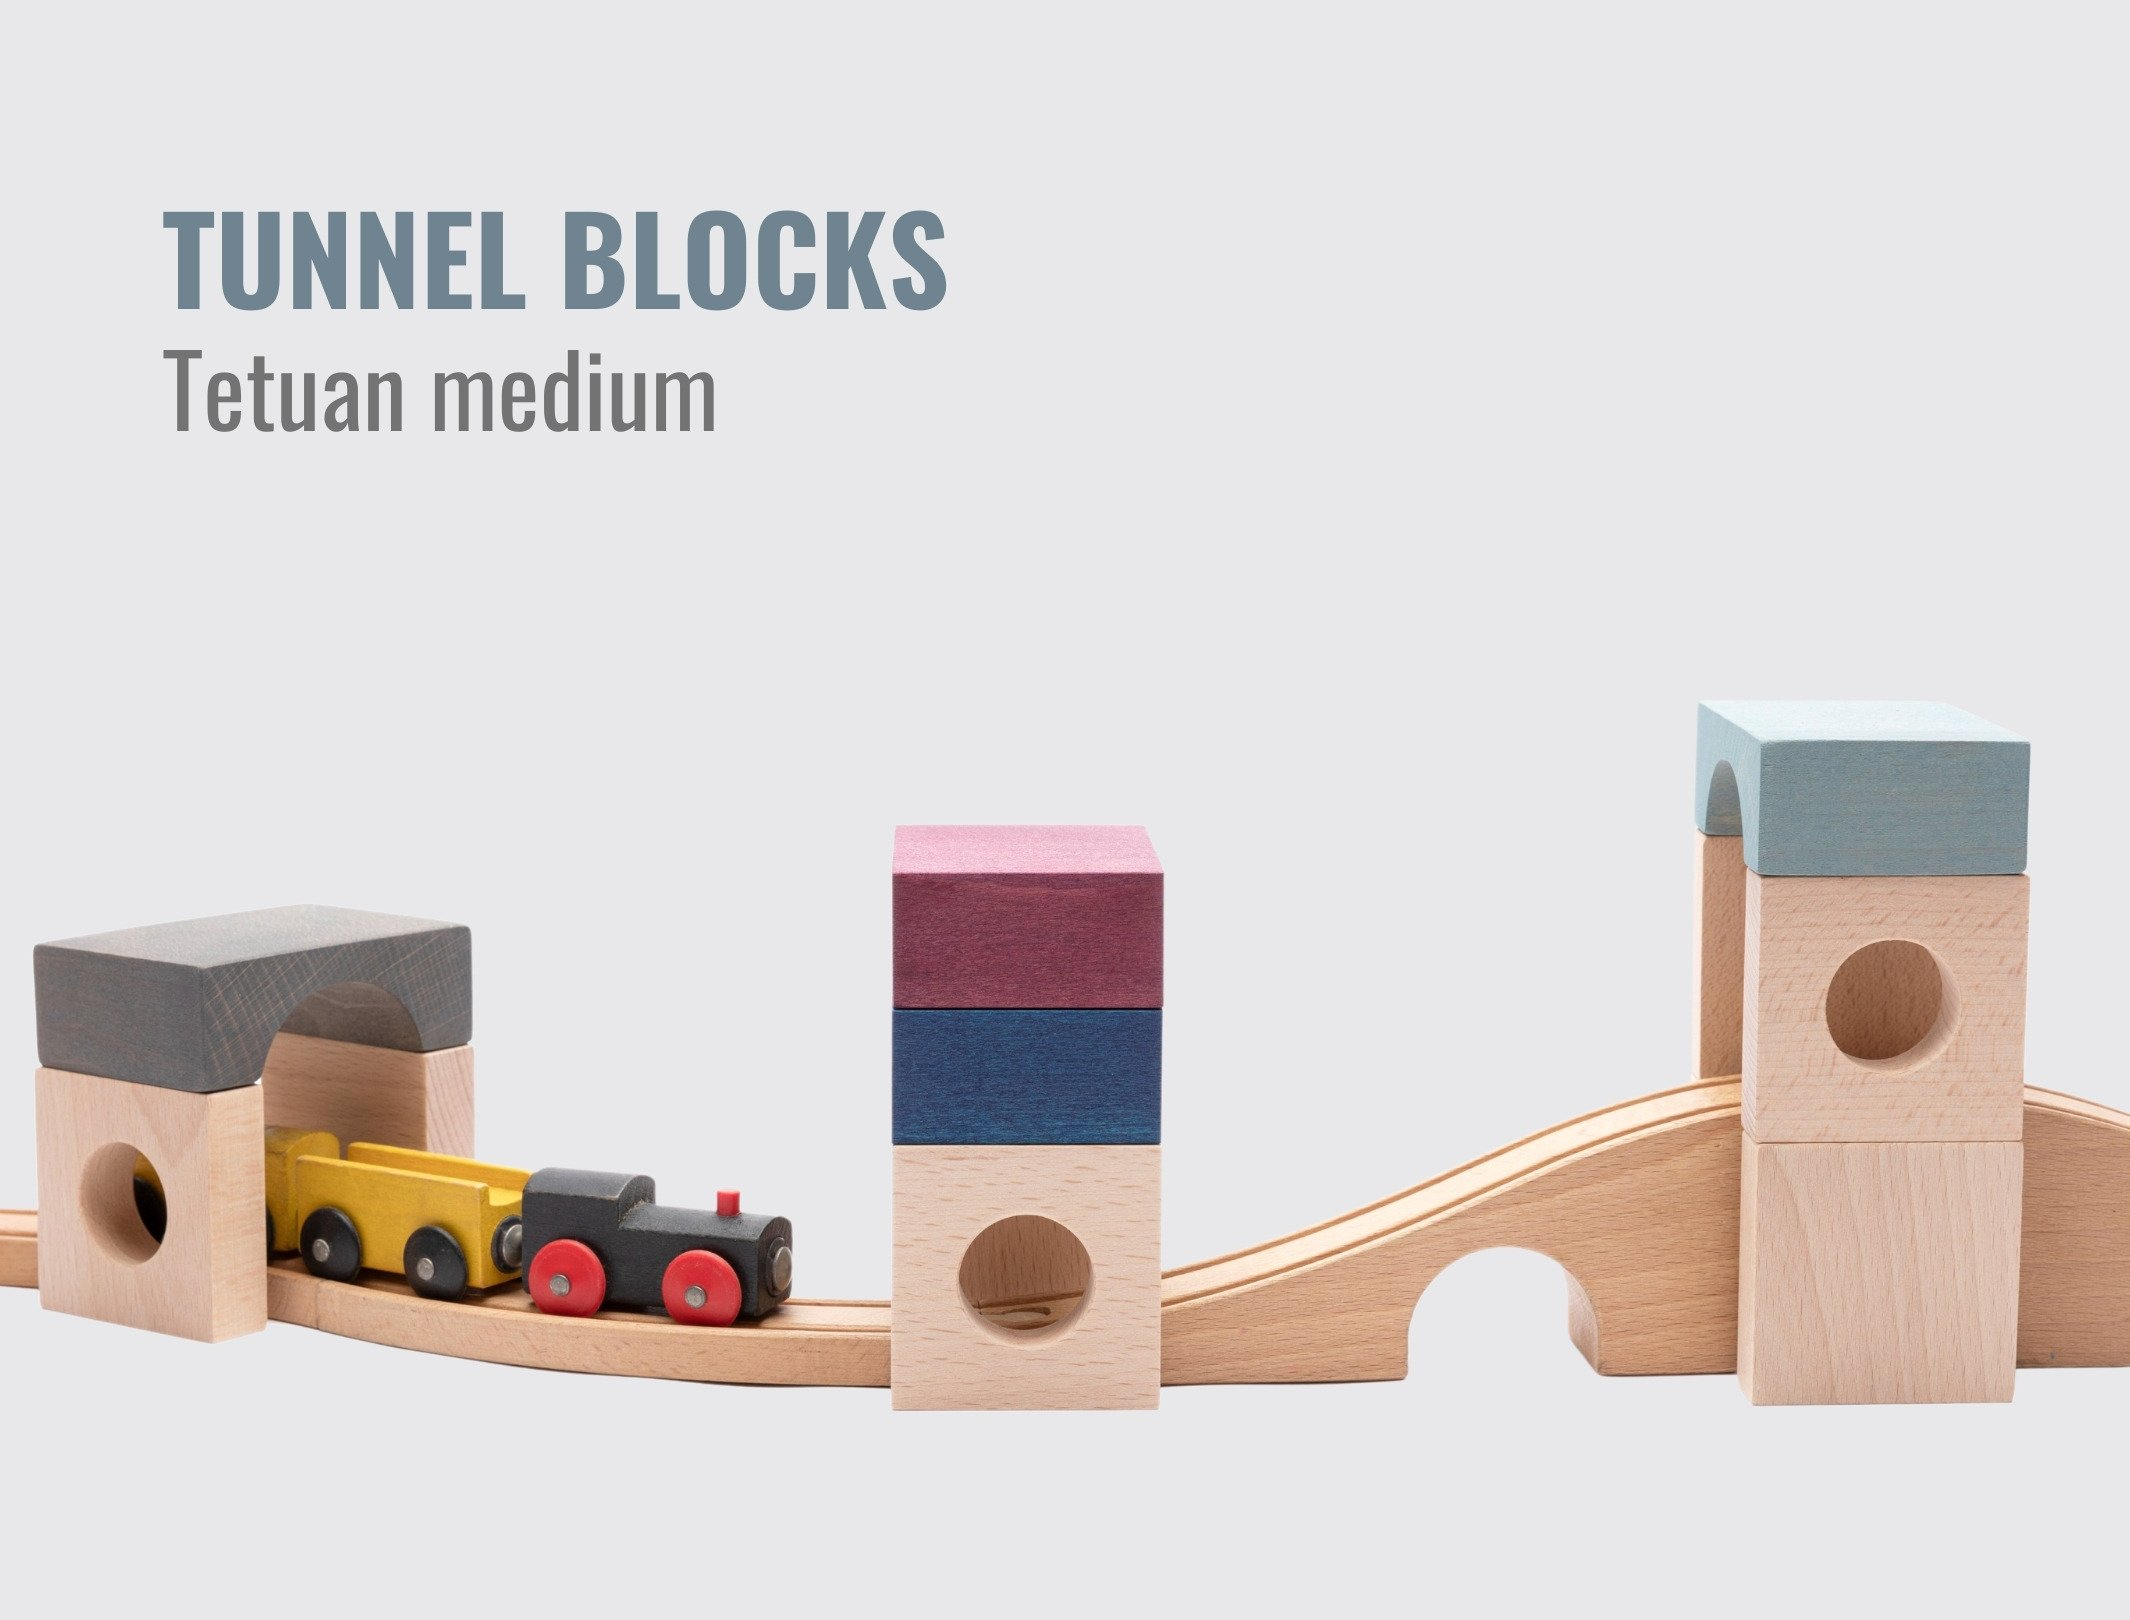 Lubulona tunnel blocks